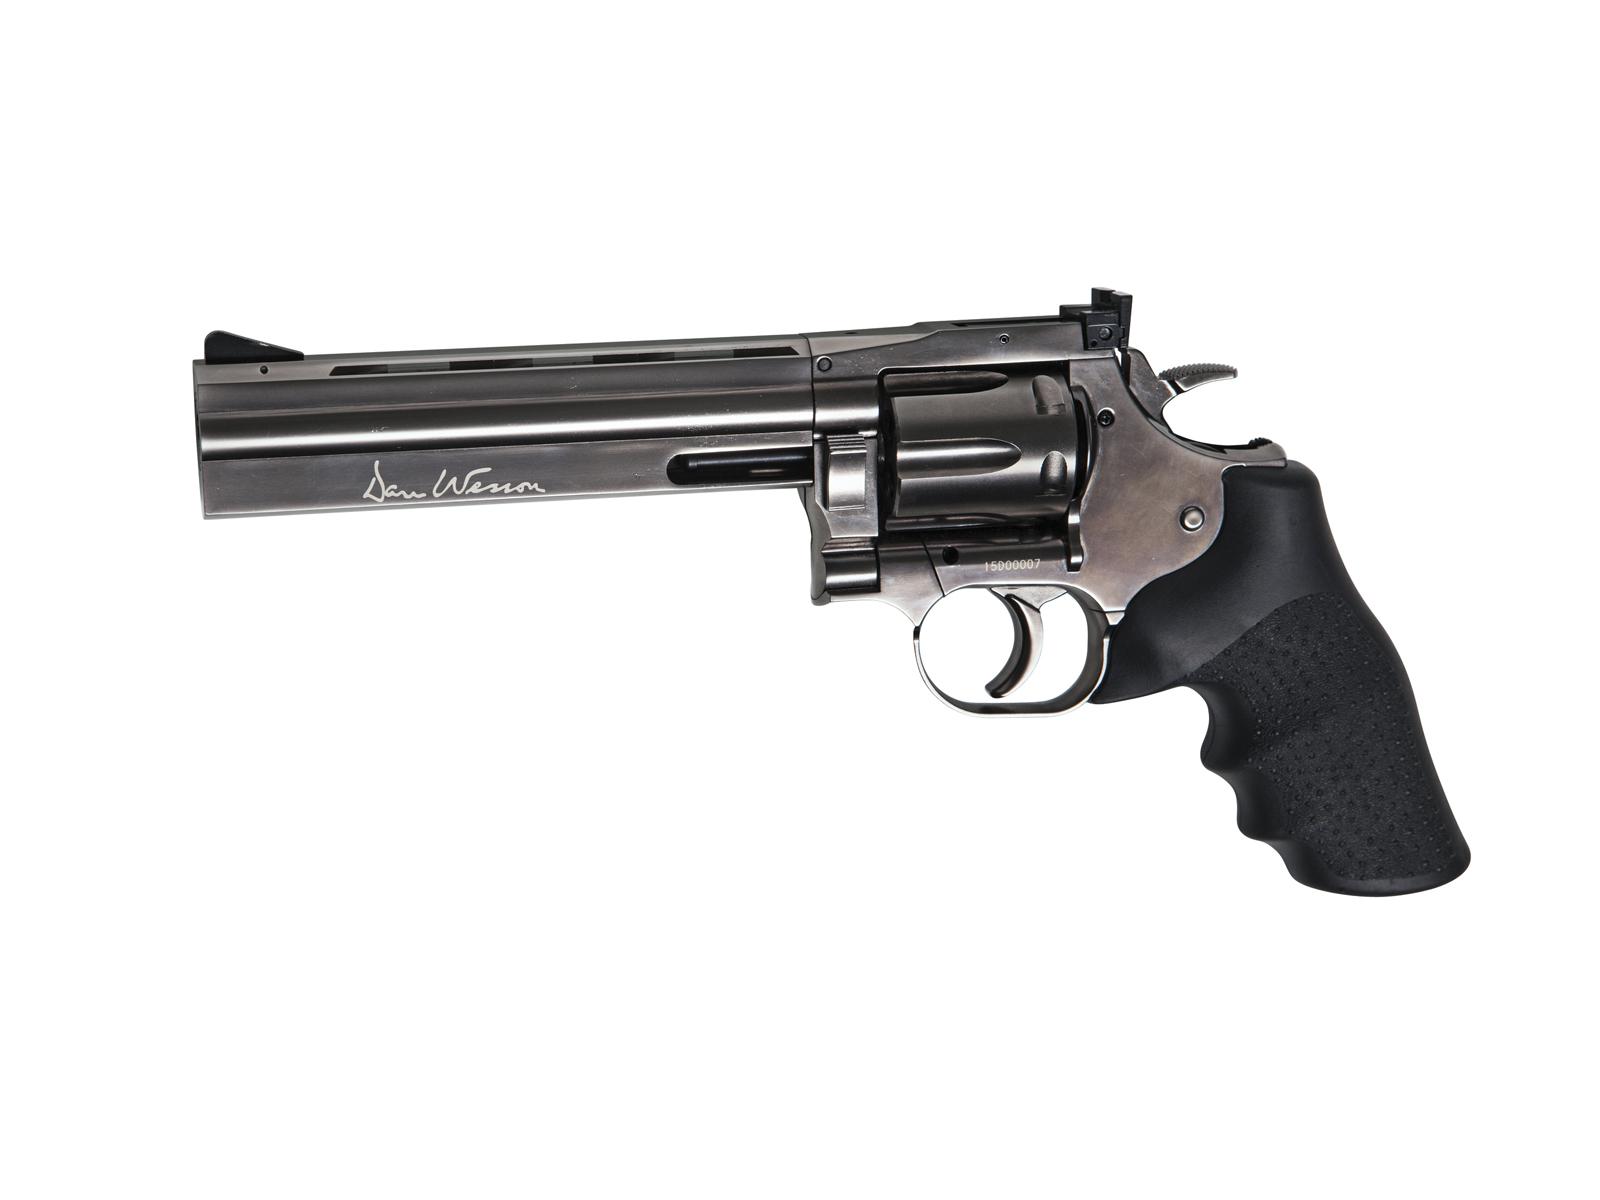 Vazdušni Pištolj Dan Wesson Grey 715 45mm 6 Co2